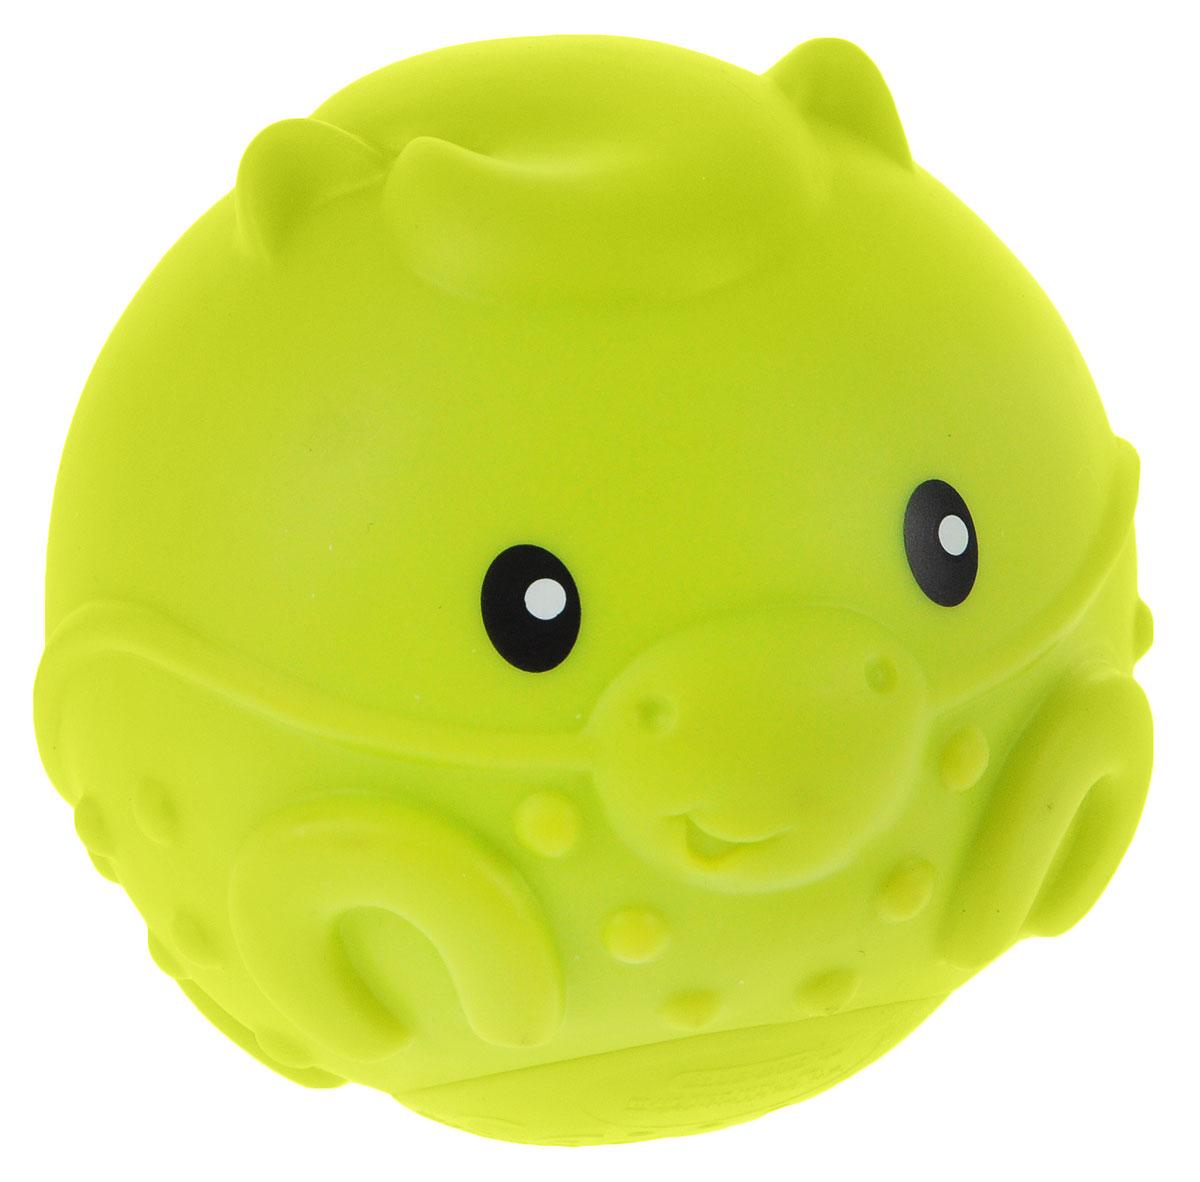 B kids Развивающая игрушка-пищалка Лошадка развивающая игрушка b dot микрофон okideoki от 18 мес